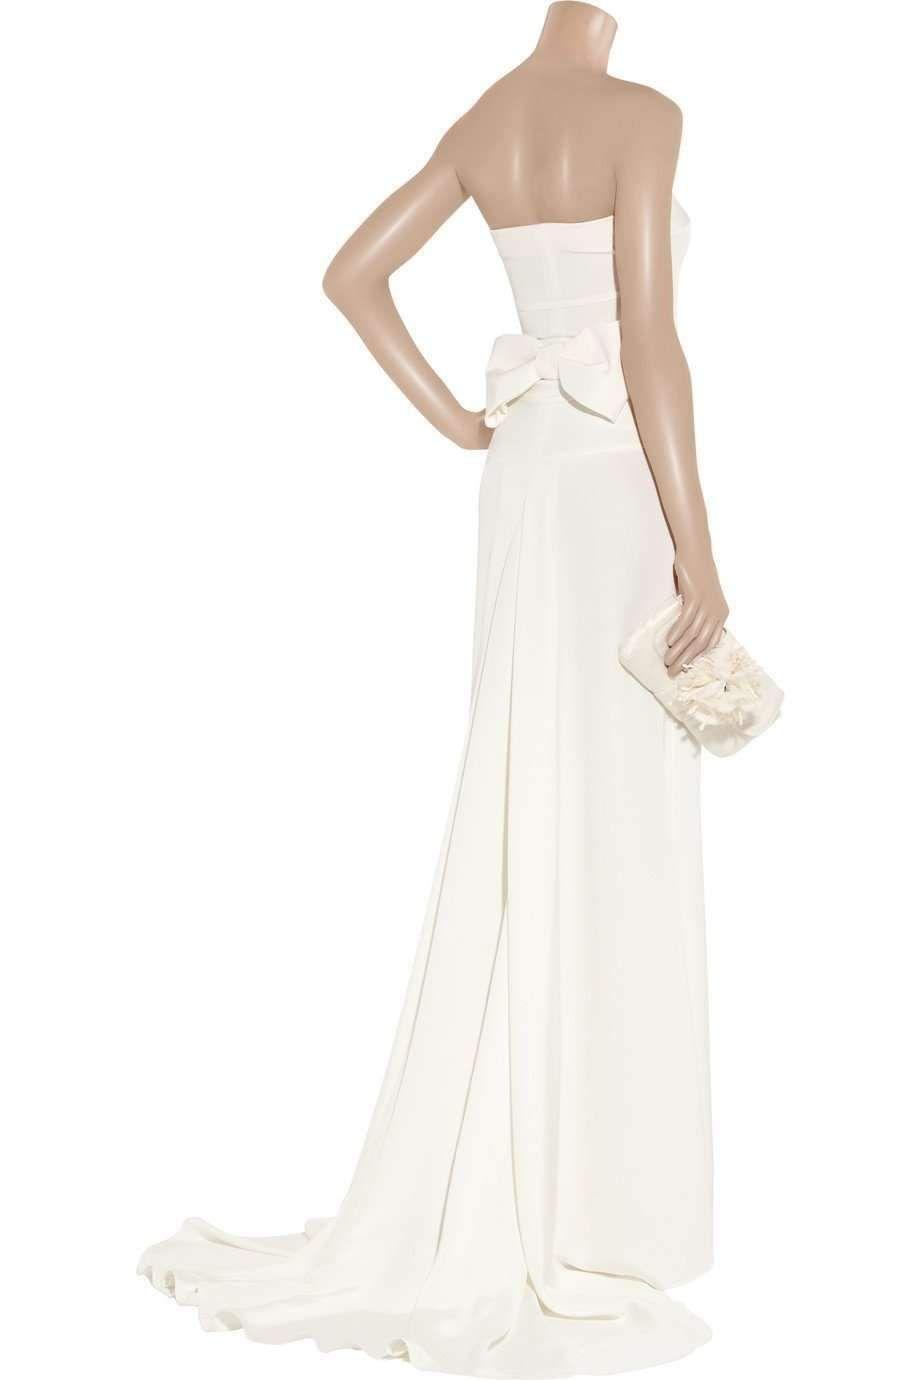 Anne of green gables wedding dress  Valentino Garavani Wedding Ivory White Long Strapless Gown Bow On